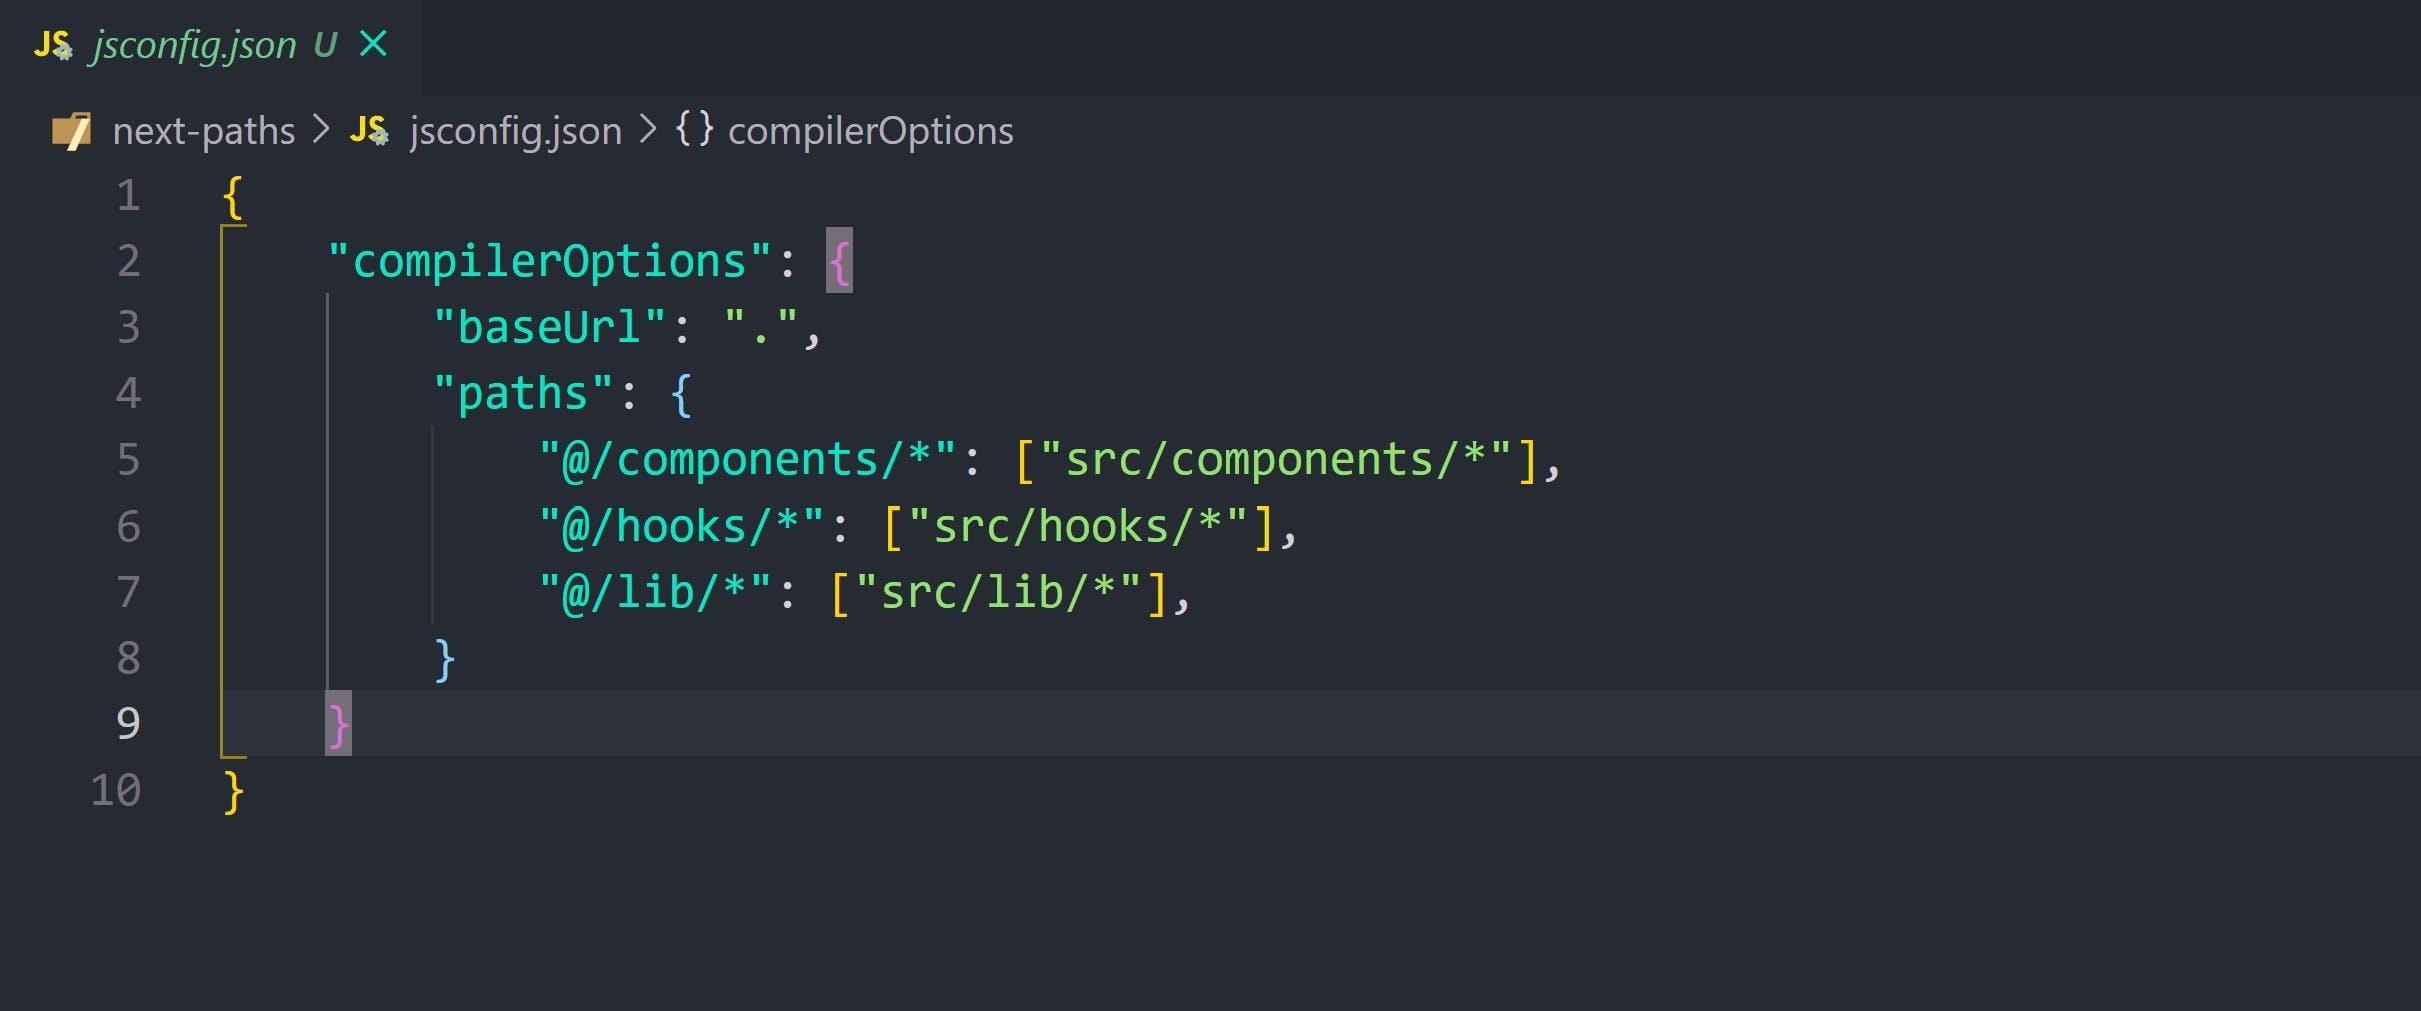 My jsconfig.json file with path alias setup